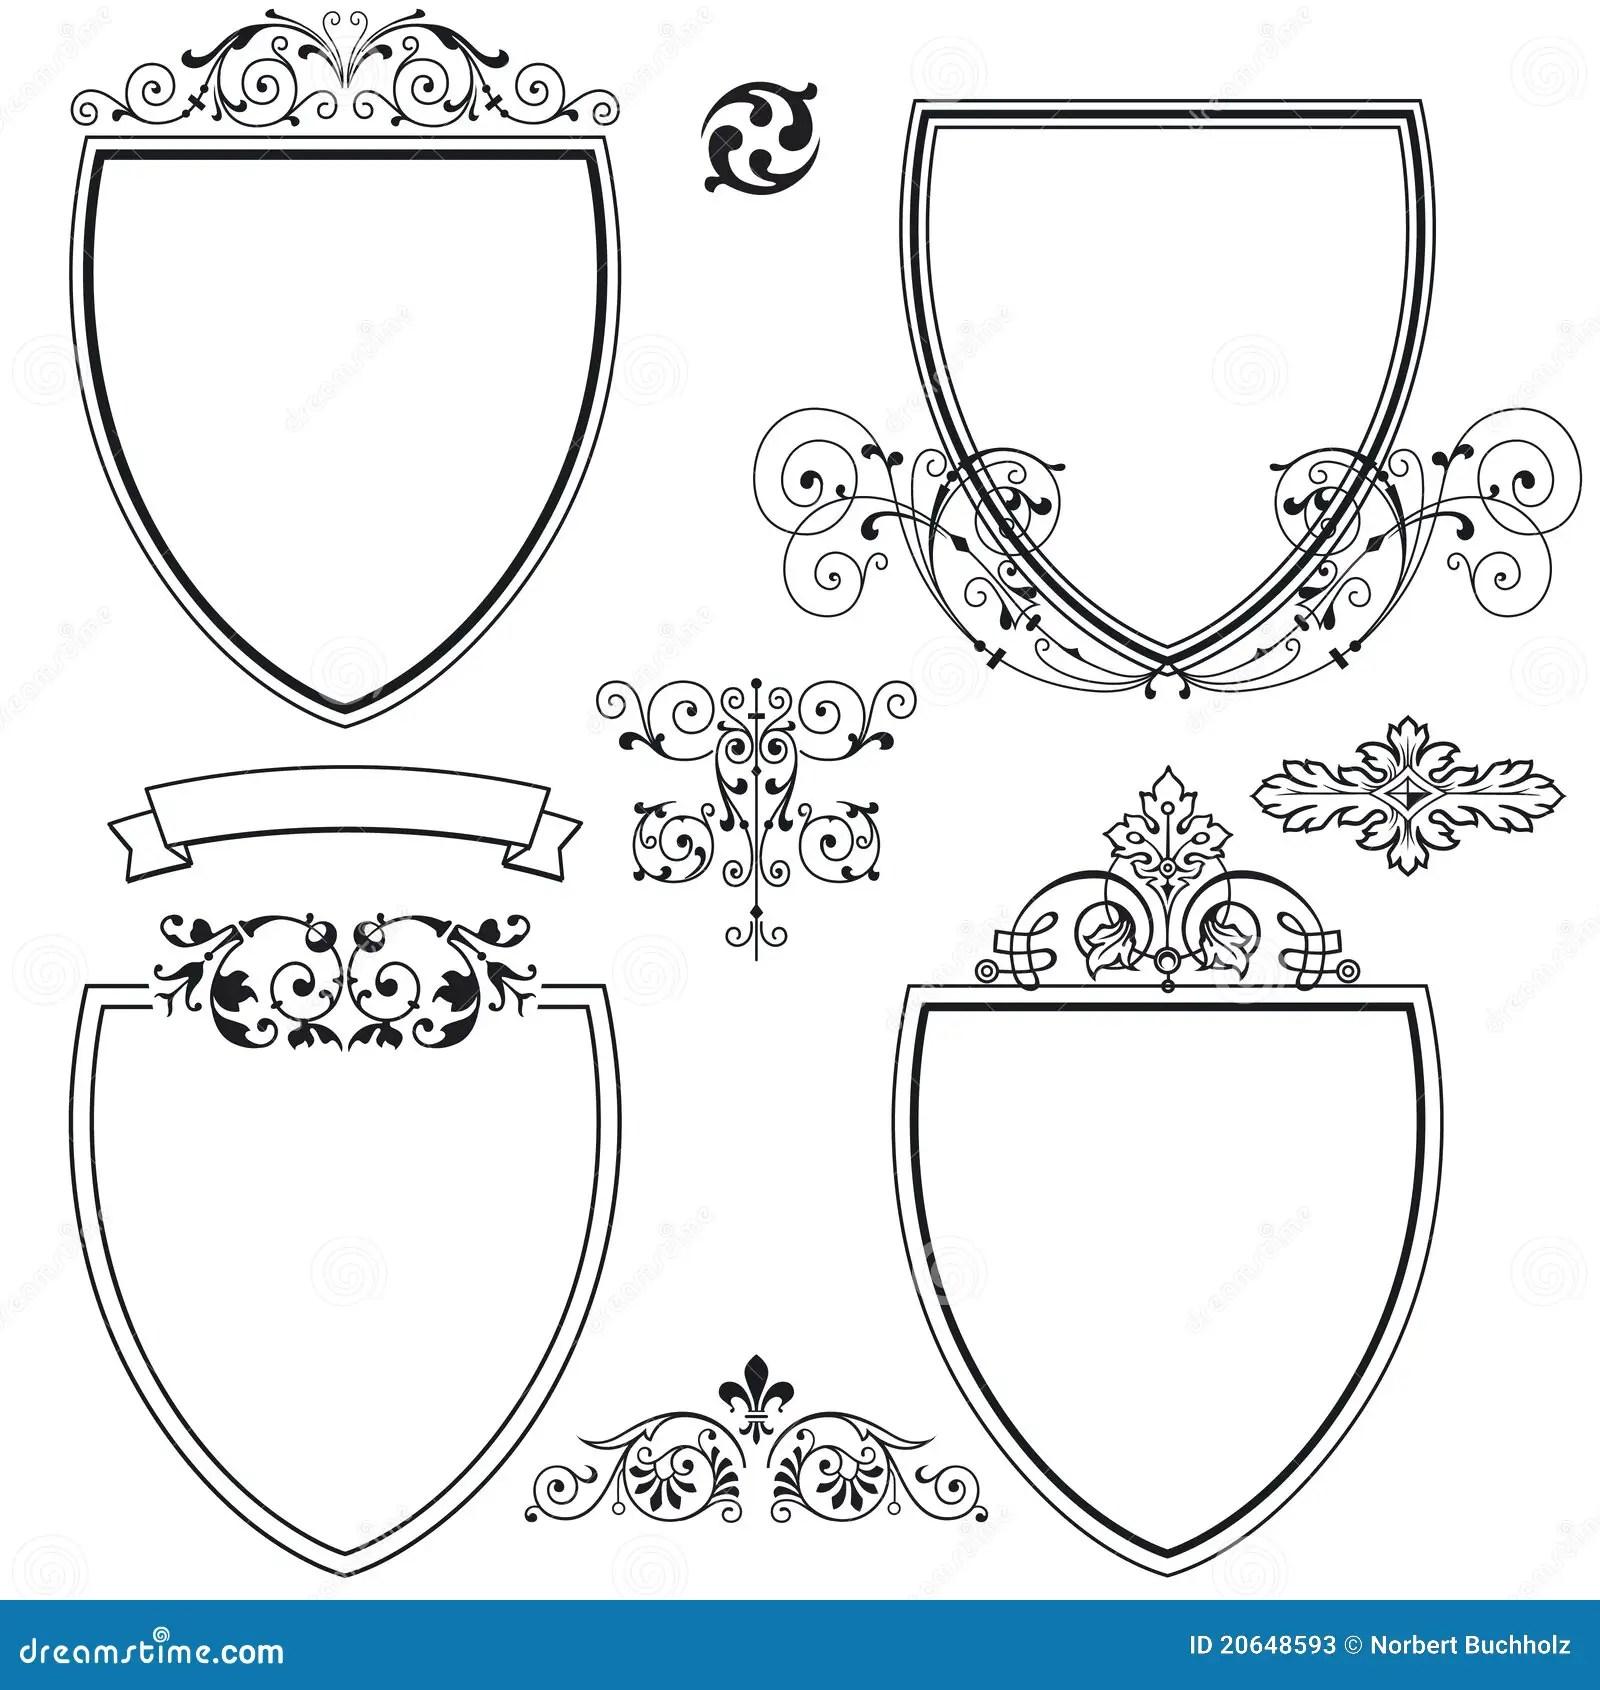 Heraldic Shields And Crests Stock Vector